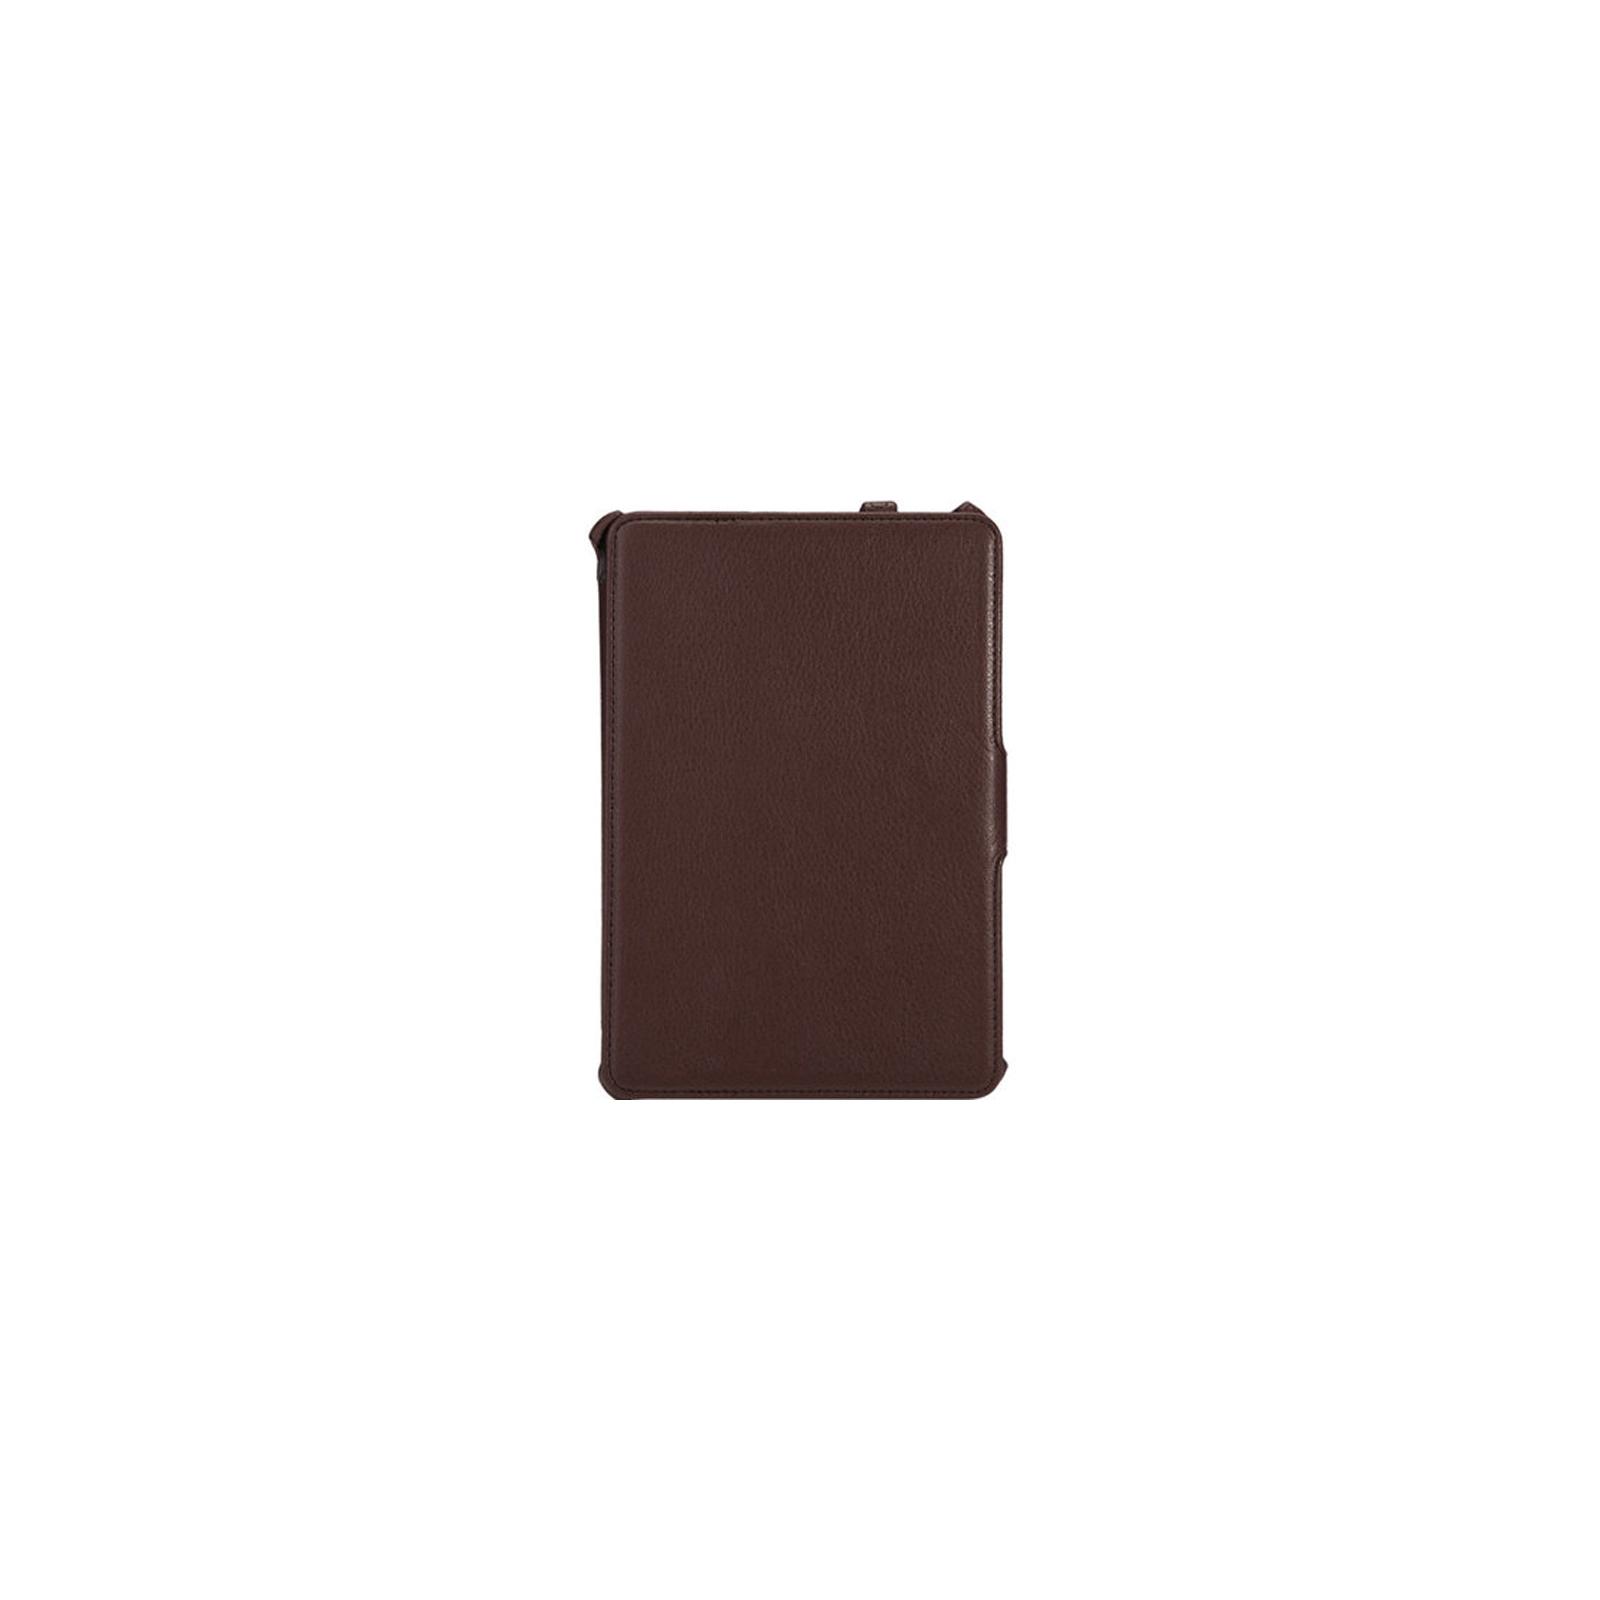 Чехол для планшета AirOn для Samsung Galaxy Tab S 2 8.0 brown (4822352778521)